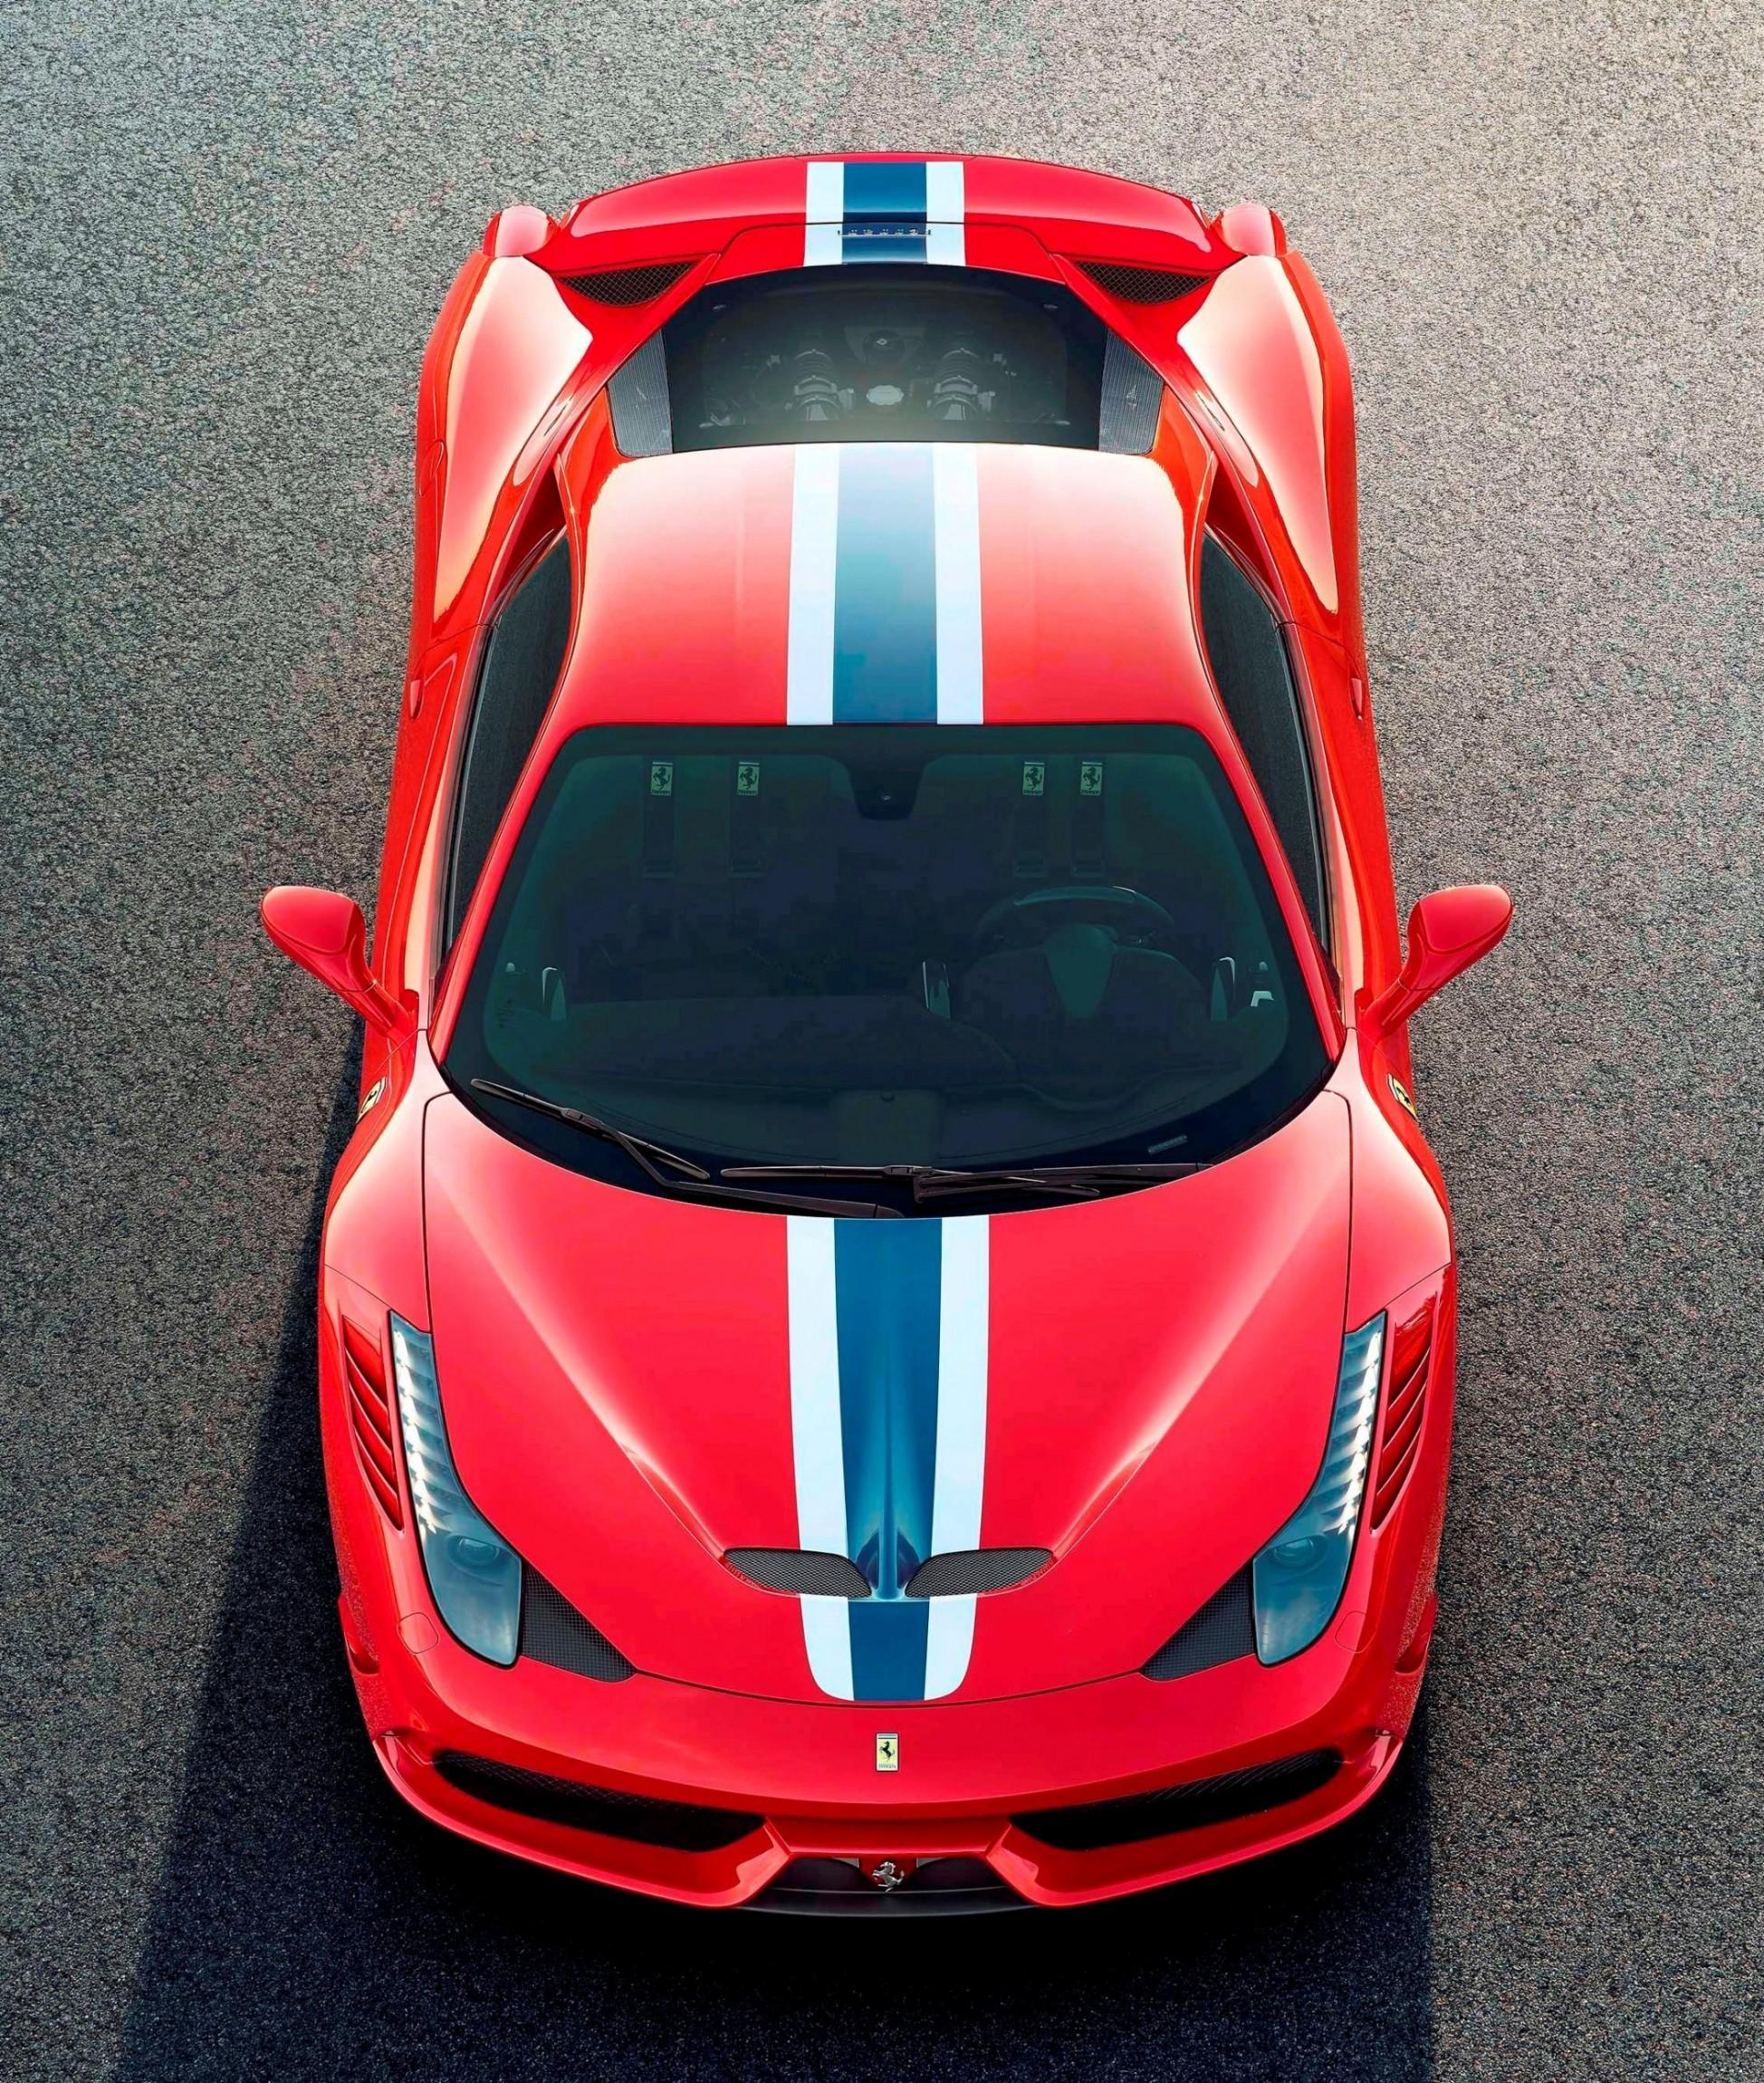 Ferrari 458: 2014 Ferrari 458 Speciale Is Glorious In Full Sight, Sound